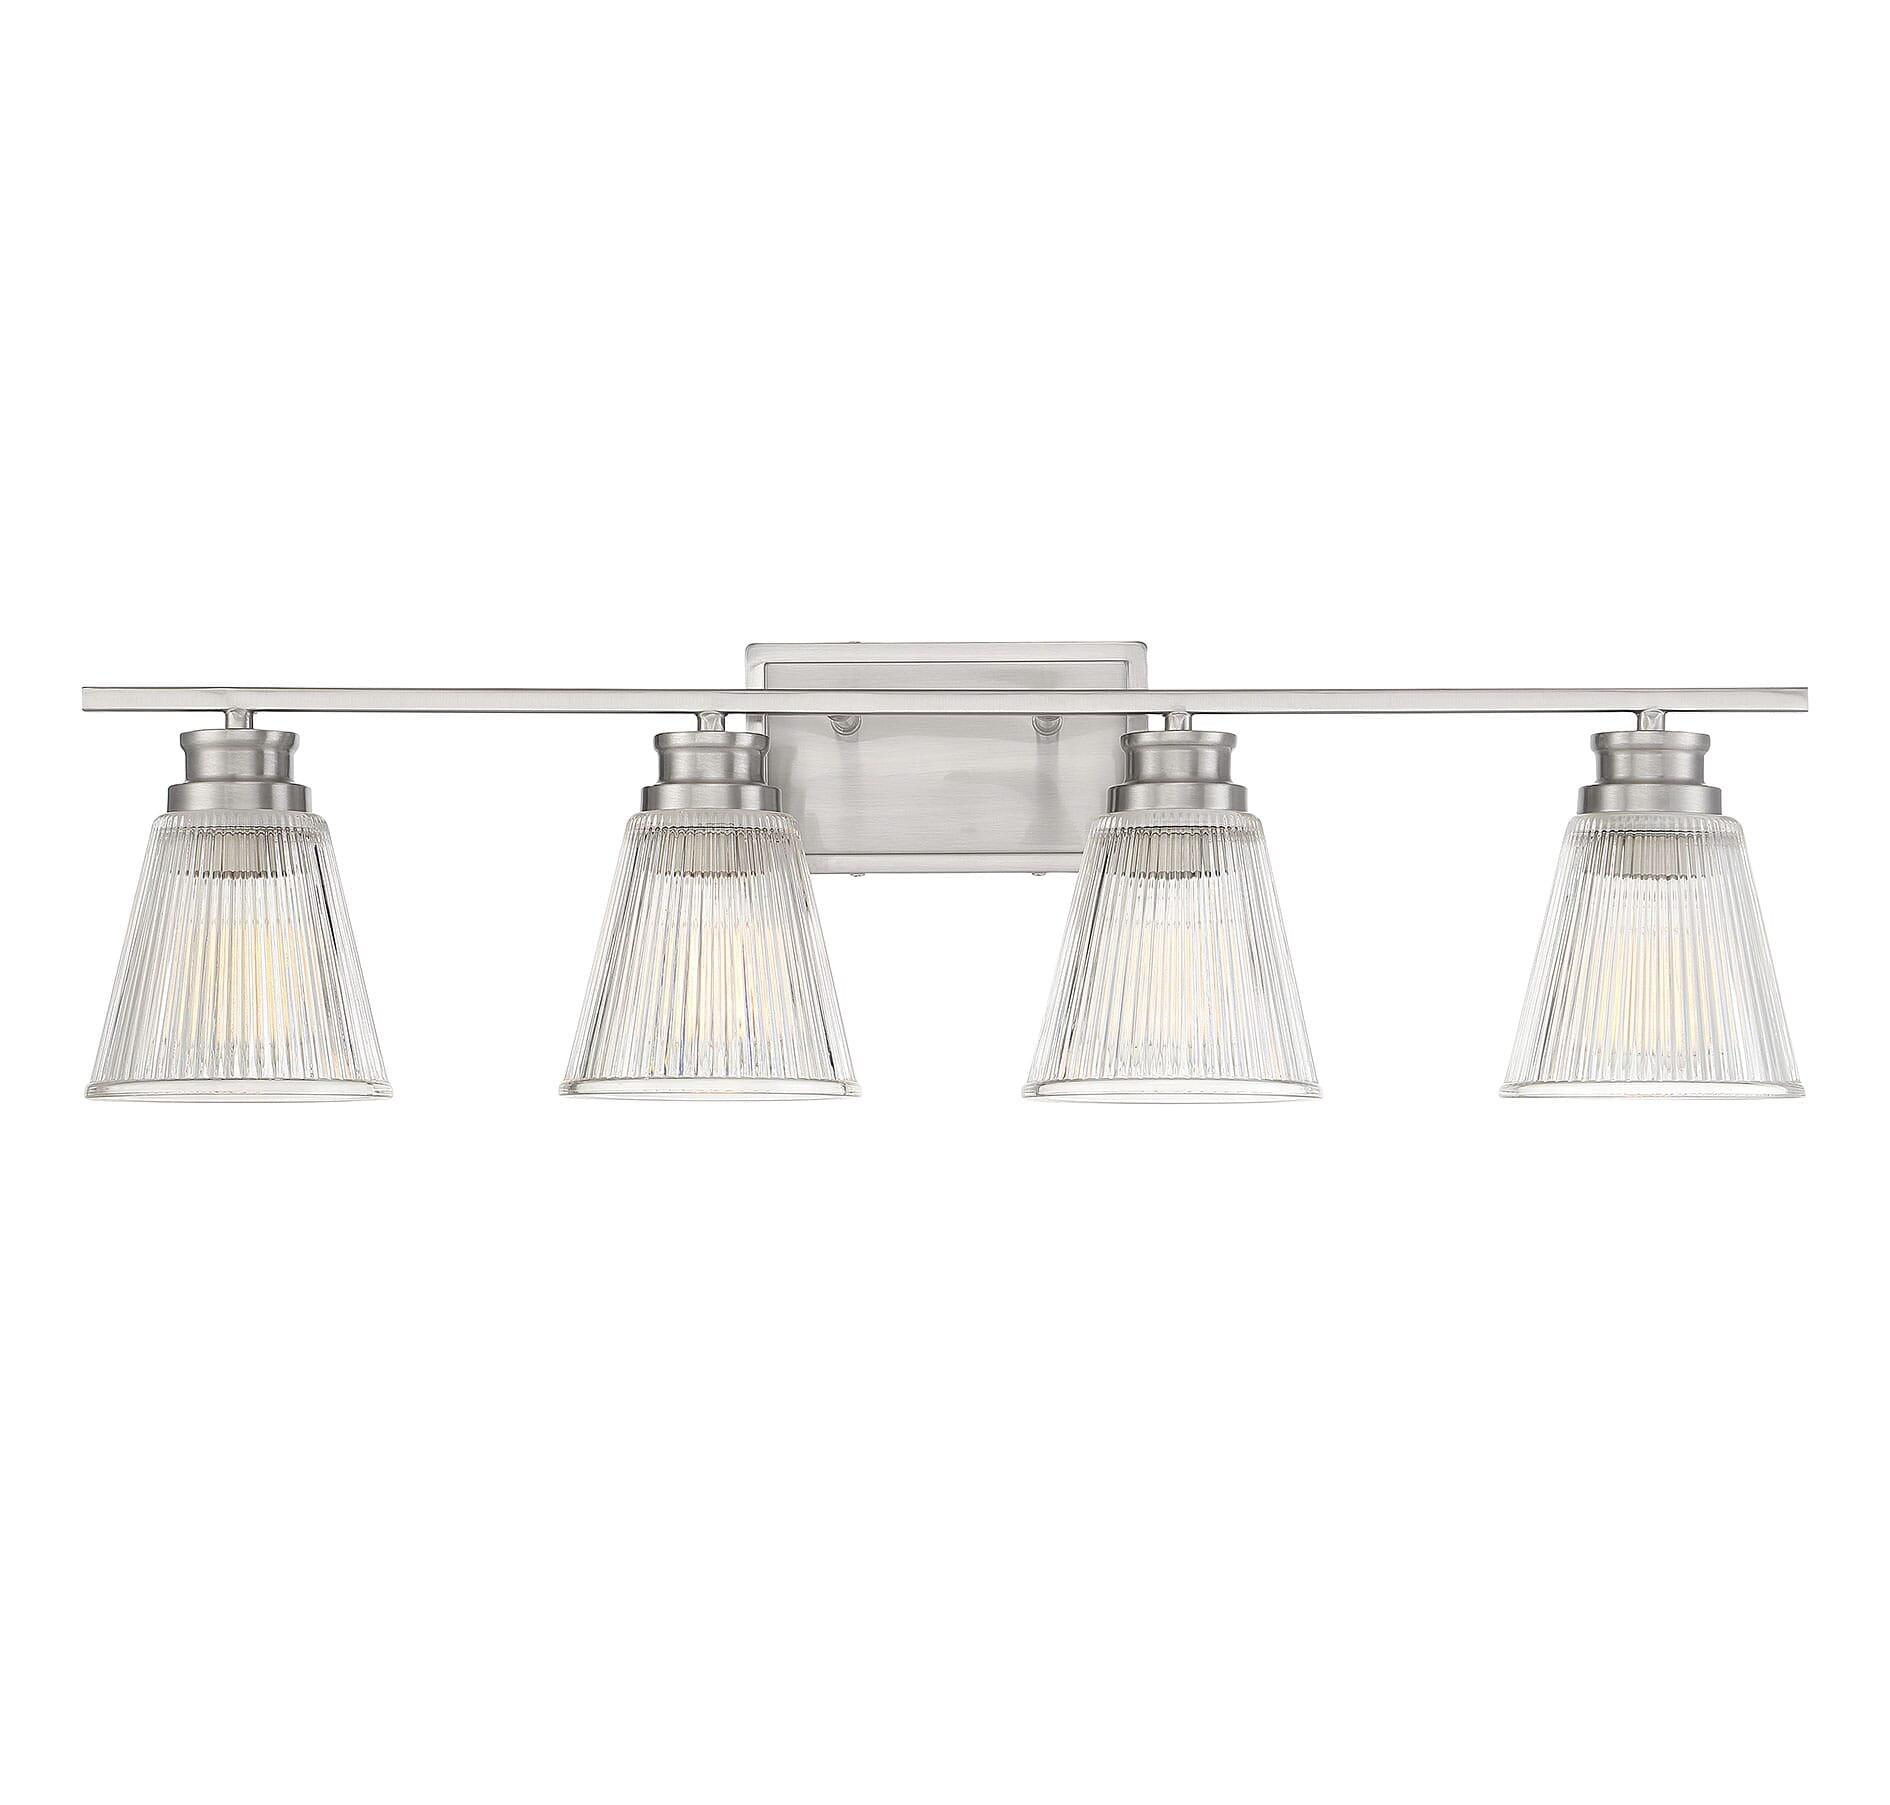 2 Bulb Bath Vanity Light Fixture Wall Mount With Plug In Receptacle White Walmart Com Walmart Com